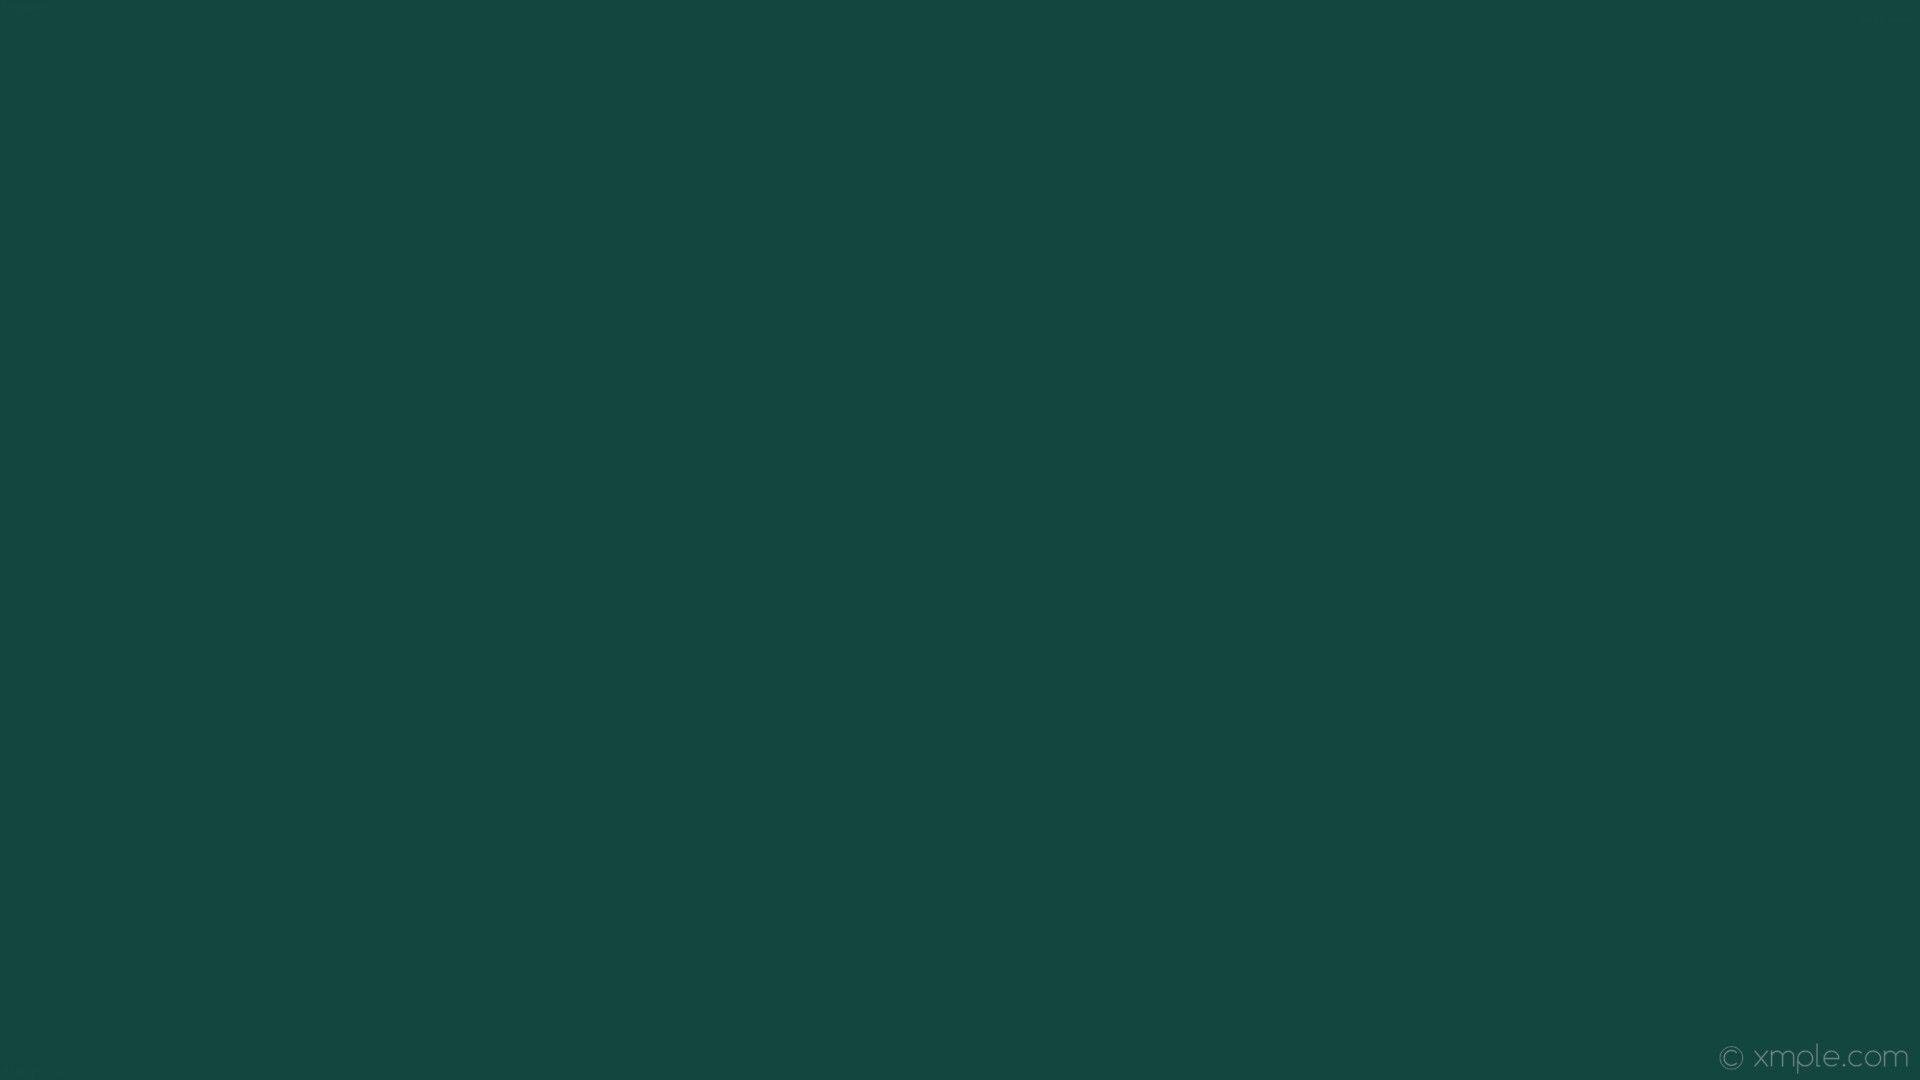 1920x1080 Wallpaper Solid Color Plain One Colour Cyan Single Dark